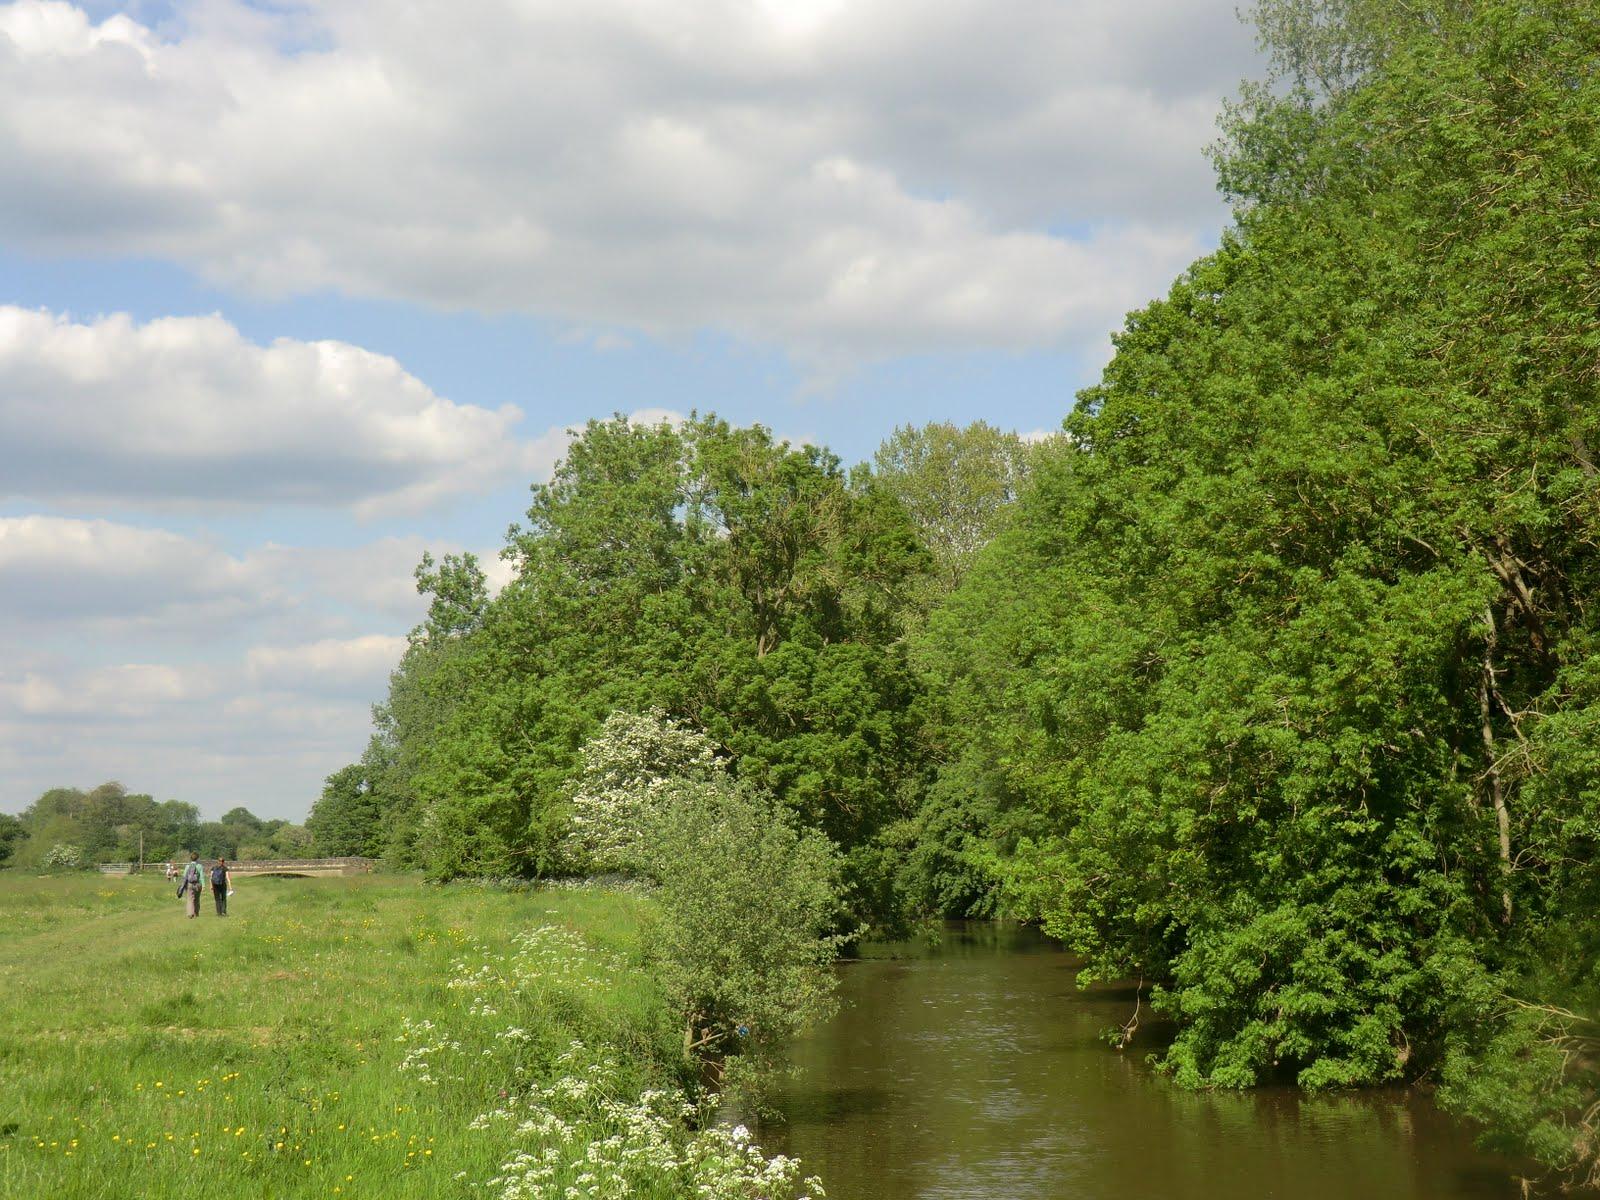 CIMG7128 River Medway